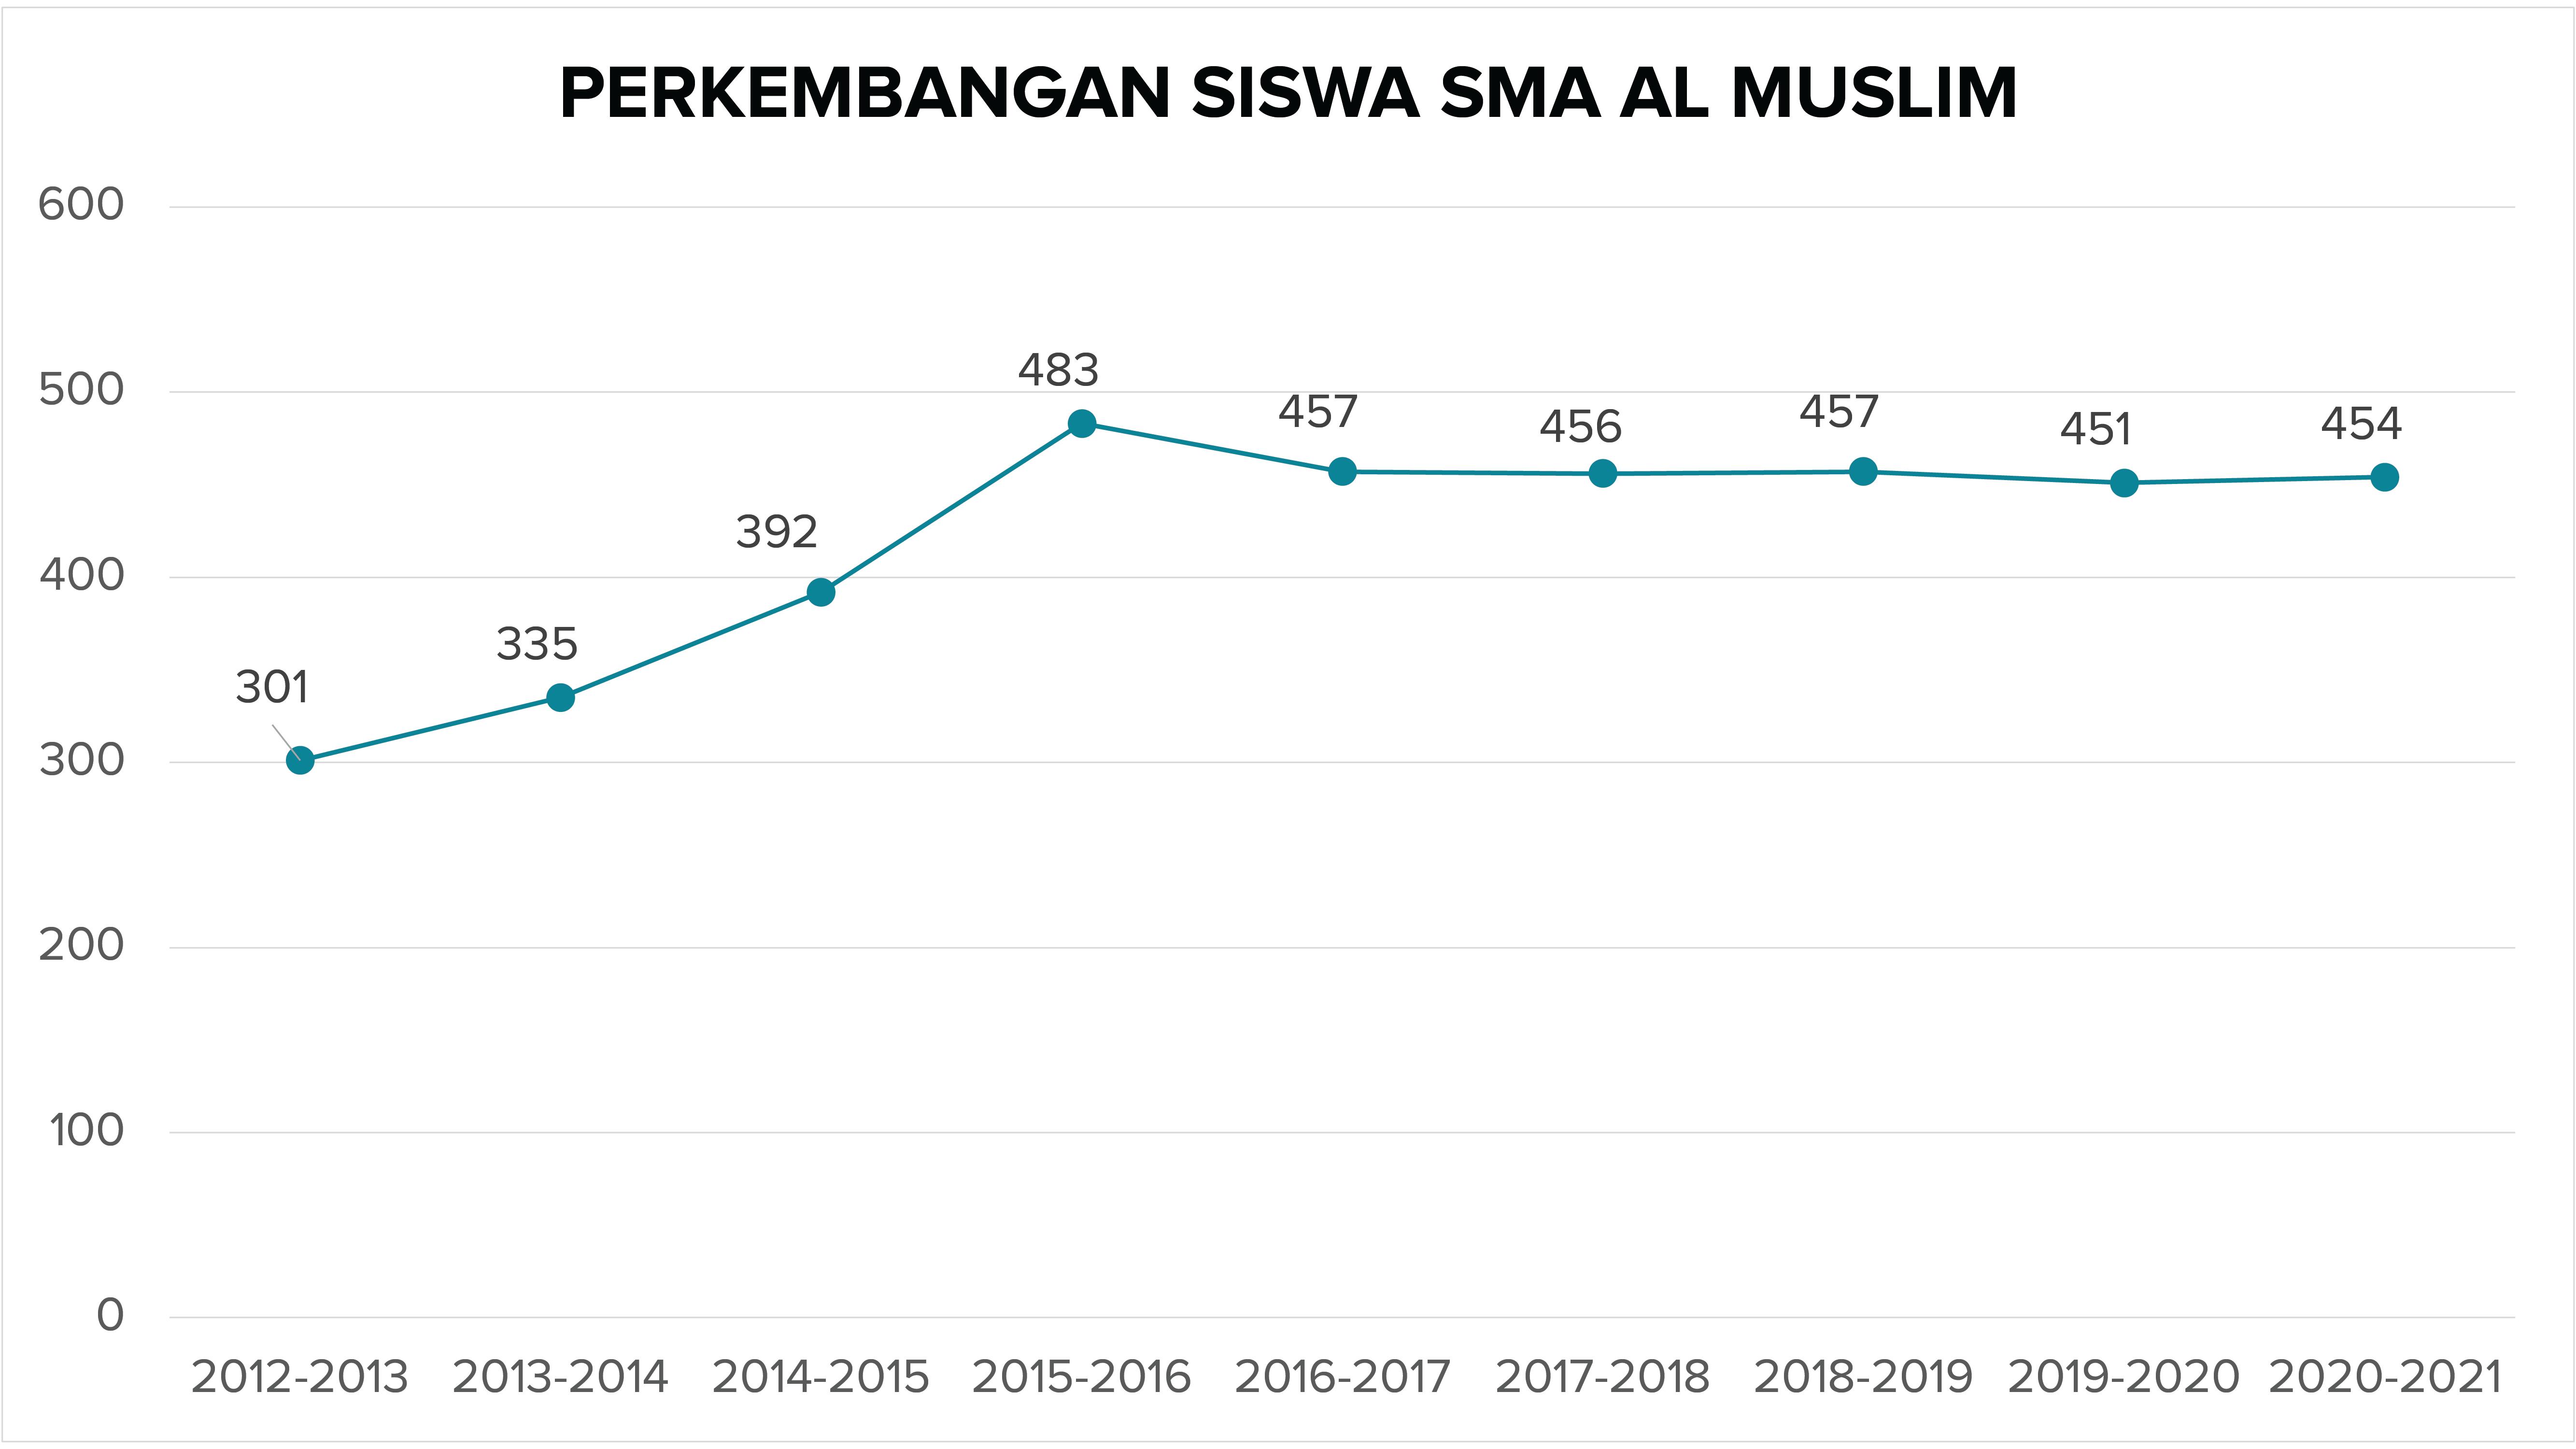 Perkembangan Siswa SMA Al Muslim